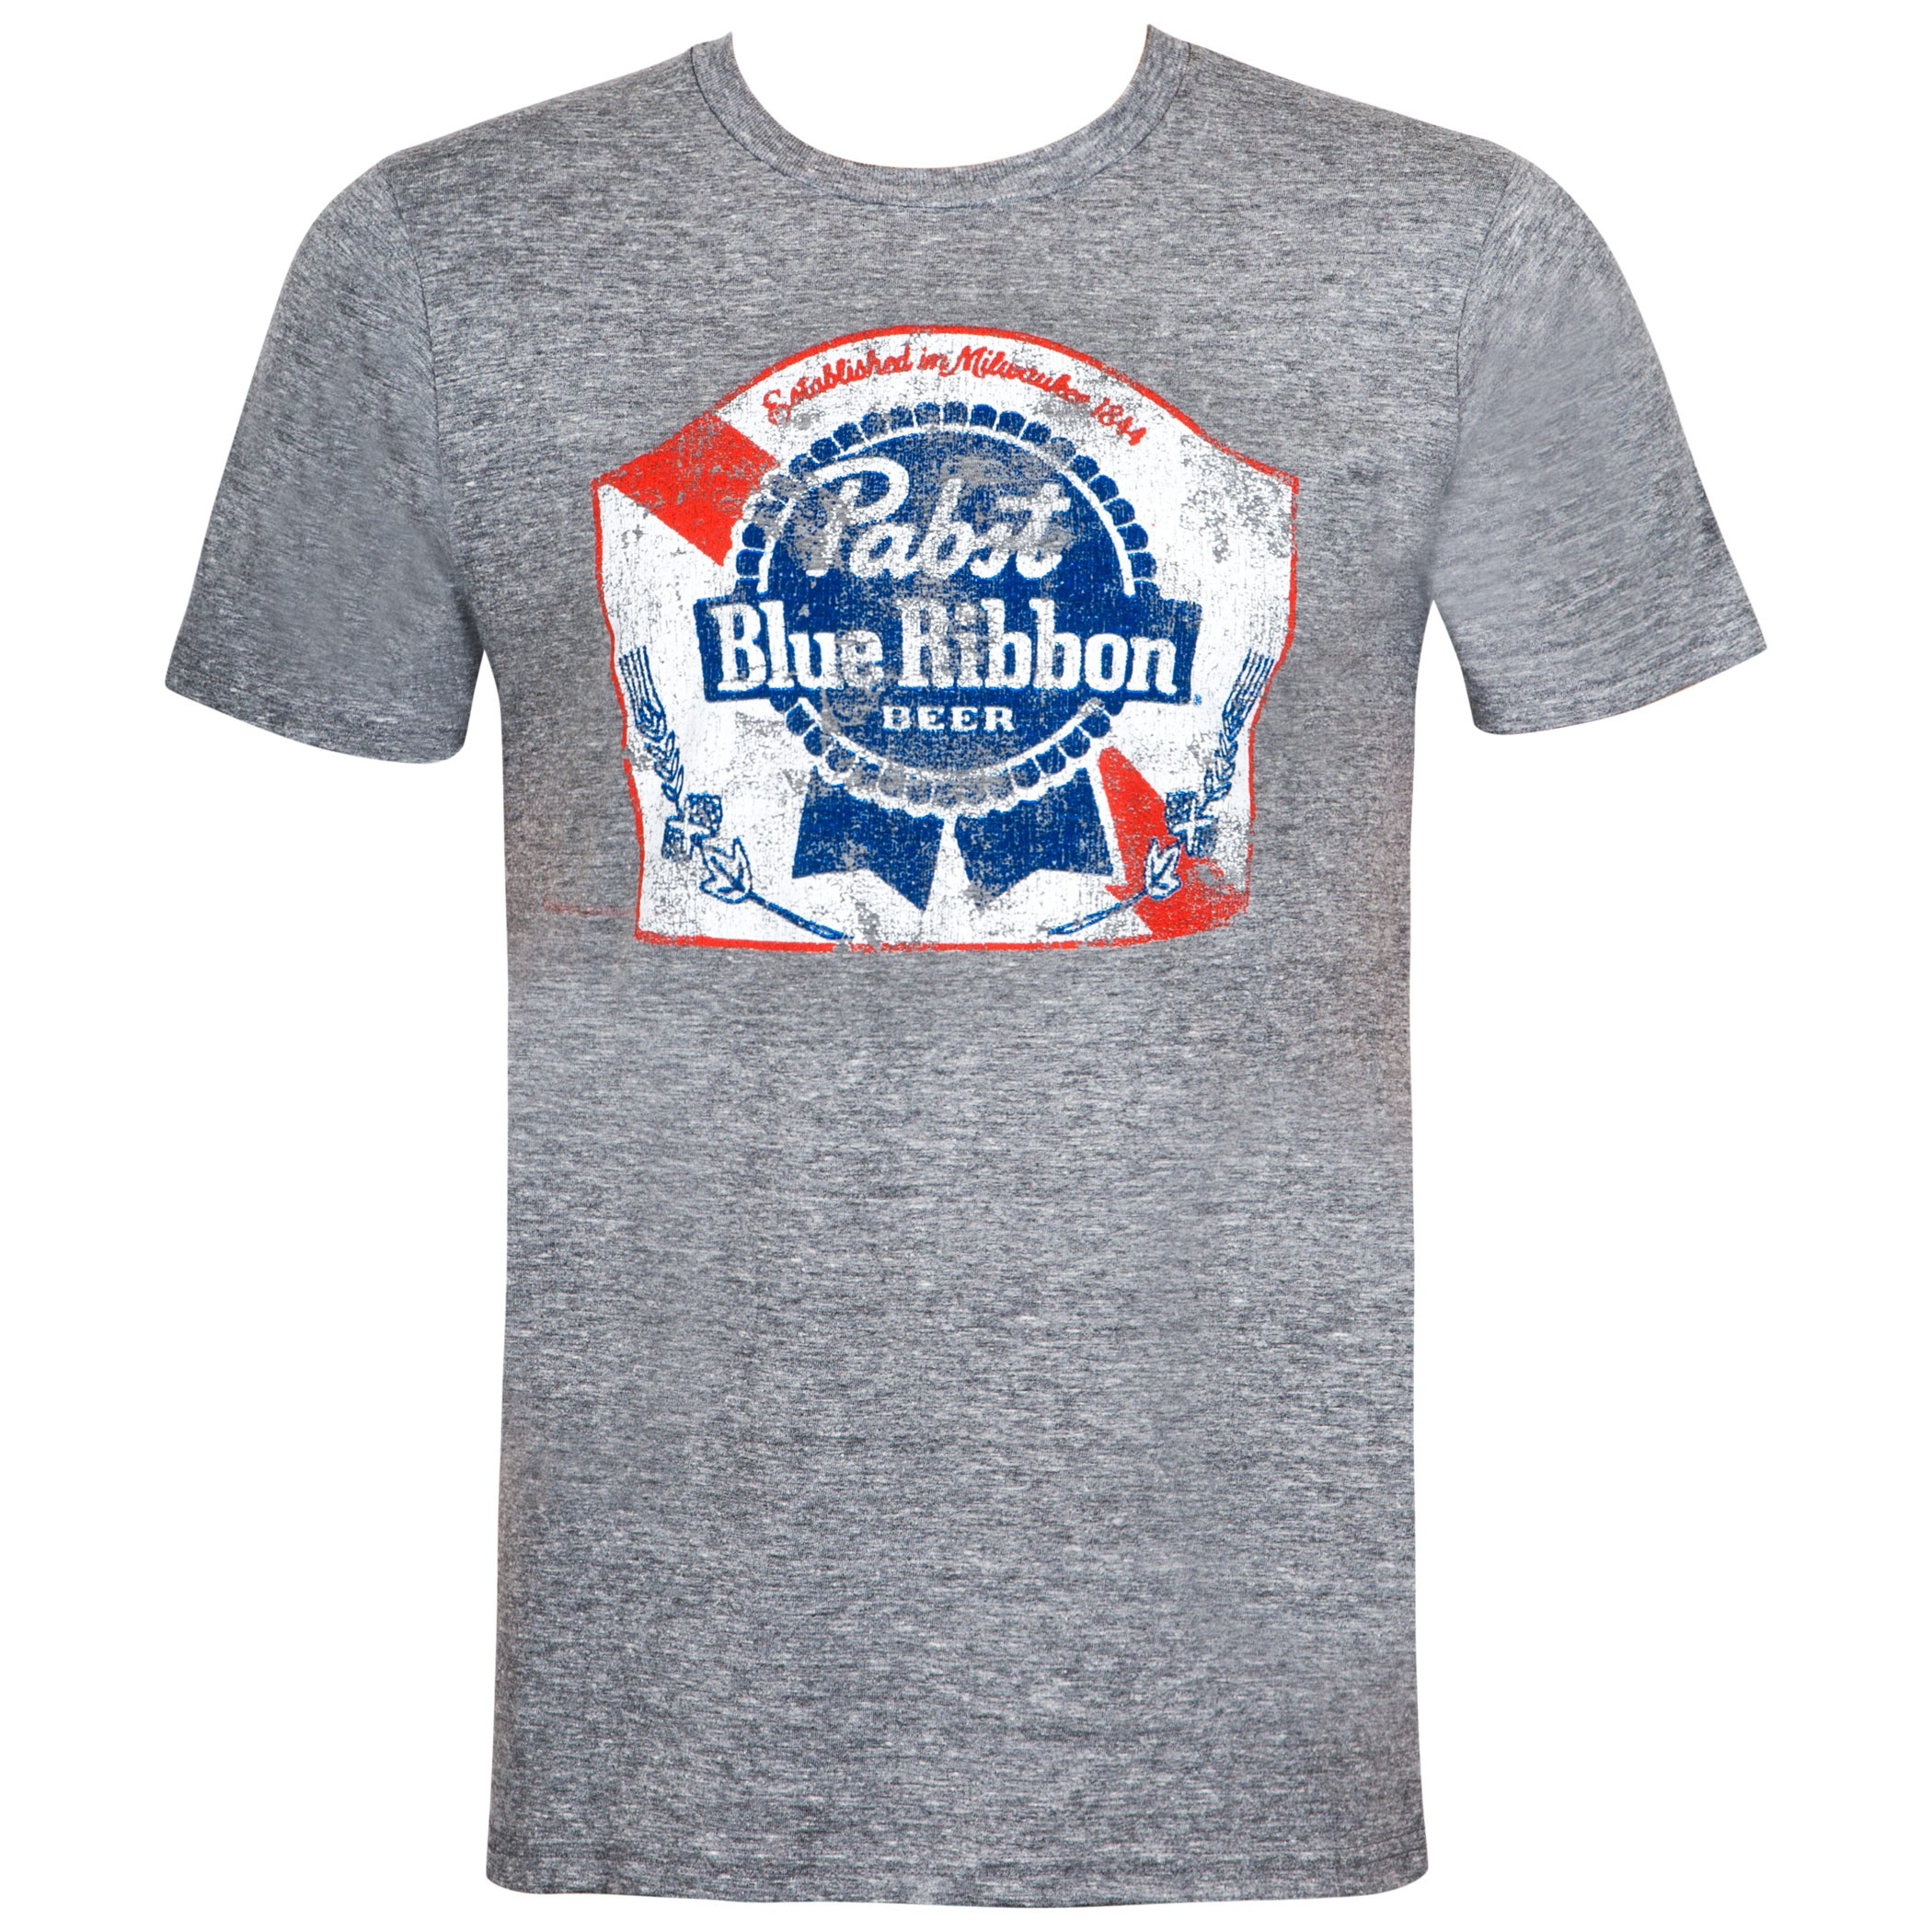 Pabst Blue Ribbon Classic Logo Grey Tee Shirt